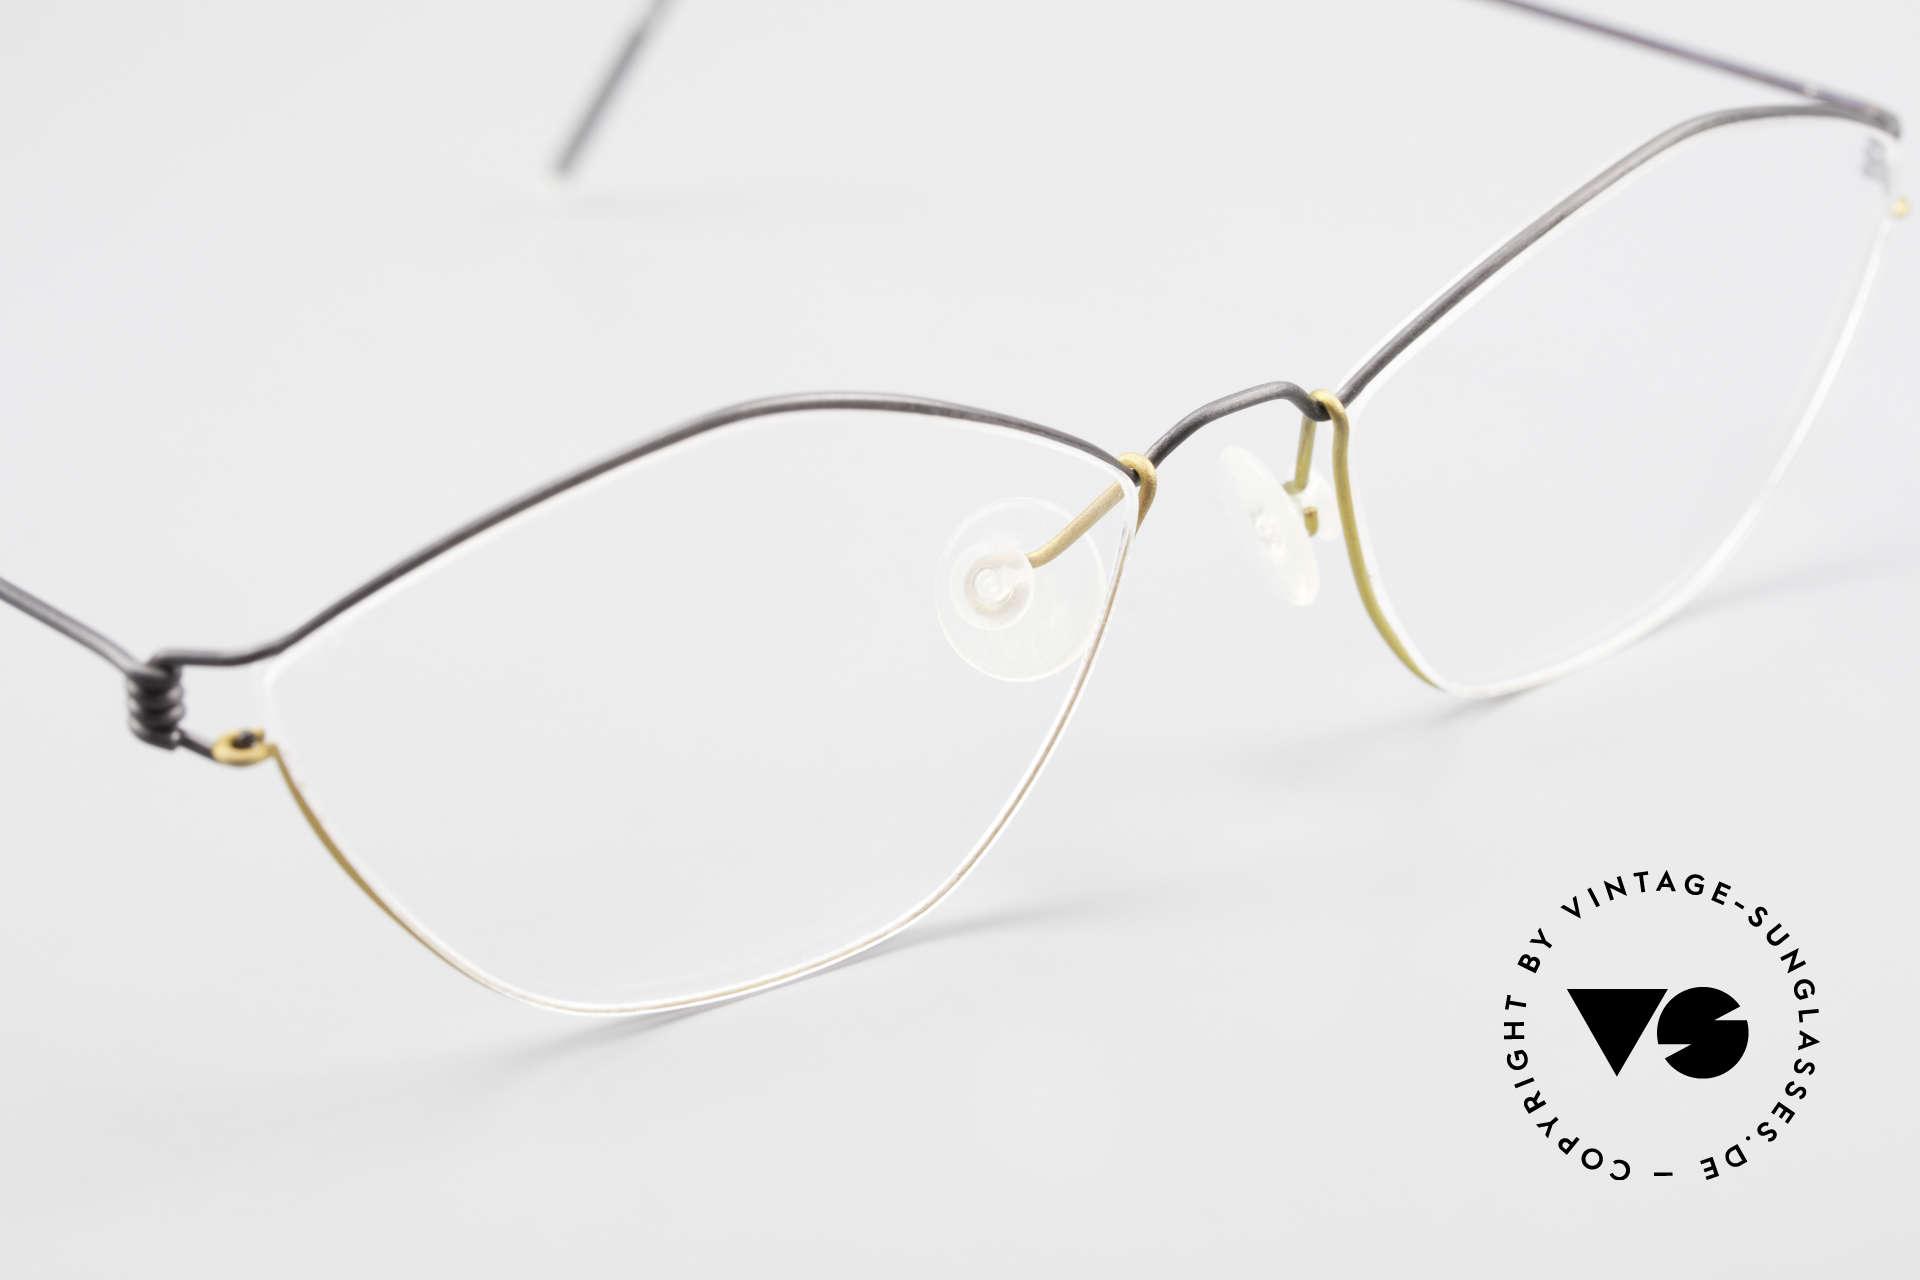 Lindberg Hydra Air Titan Rim Titanium Glasses For Ladies, unworn, NOS, with original magnetic case by Lindberg, Made for Women